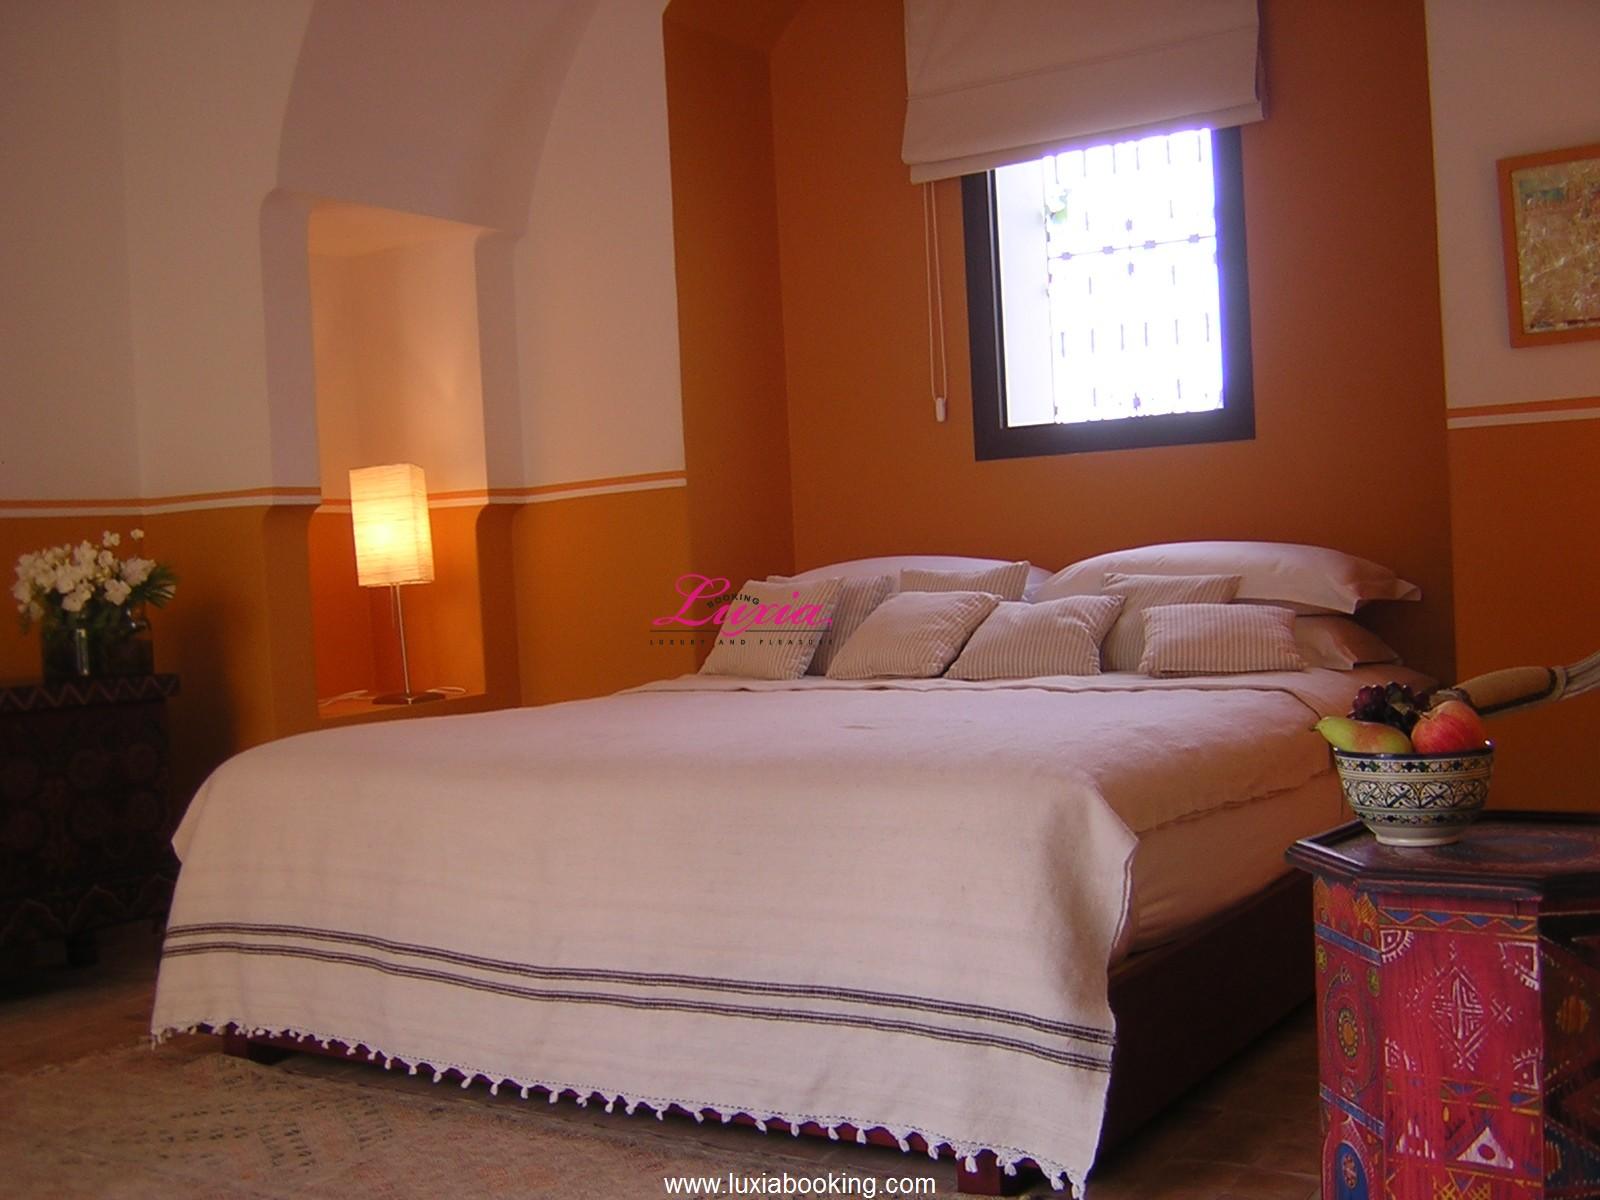 chambre beige prune decoration chambre prune une chambre d - Chambre Beige Et Prune